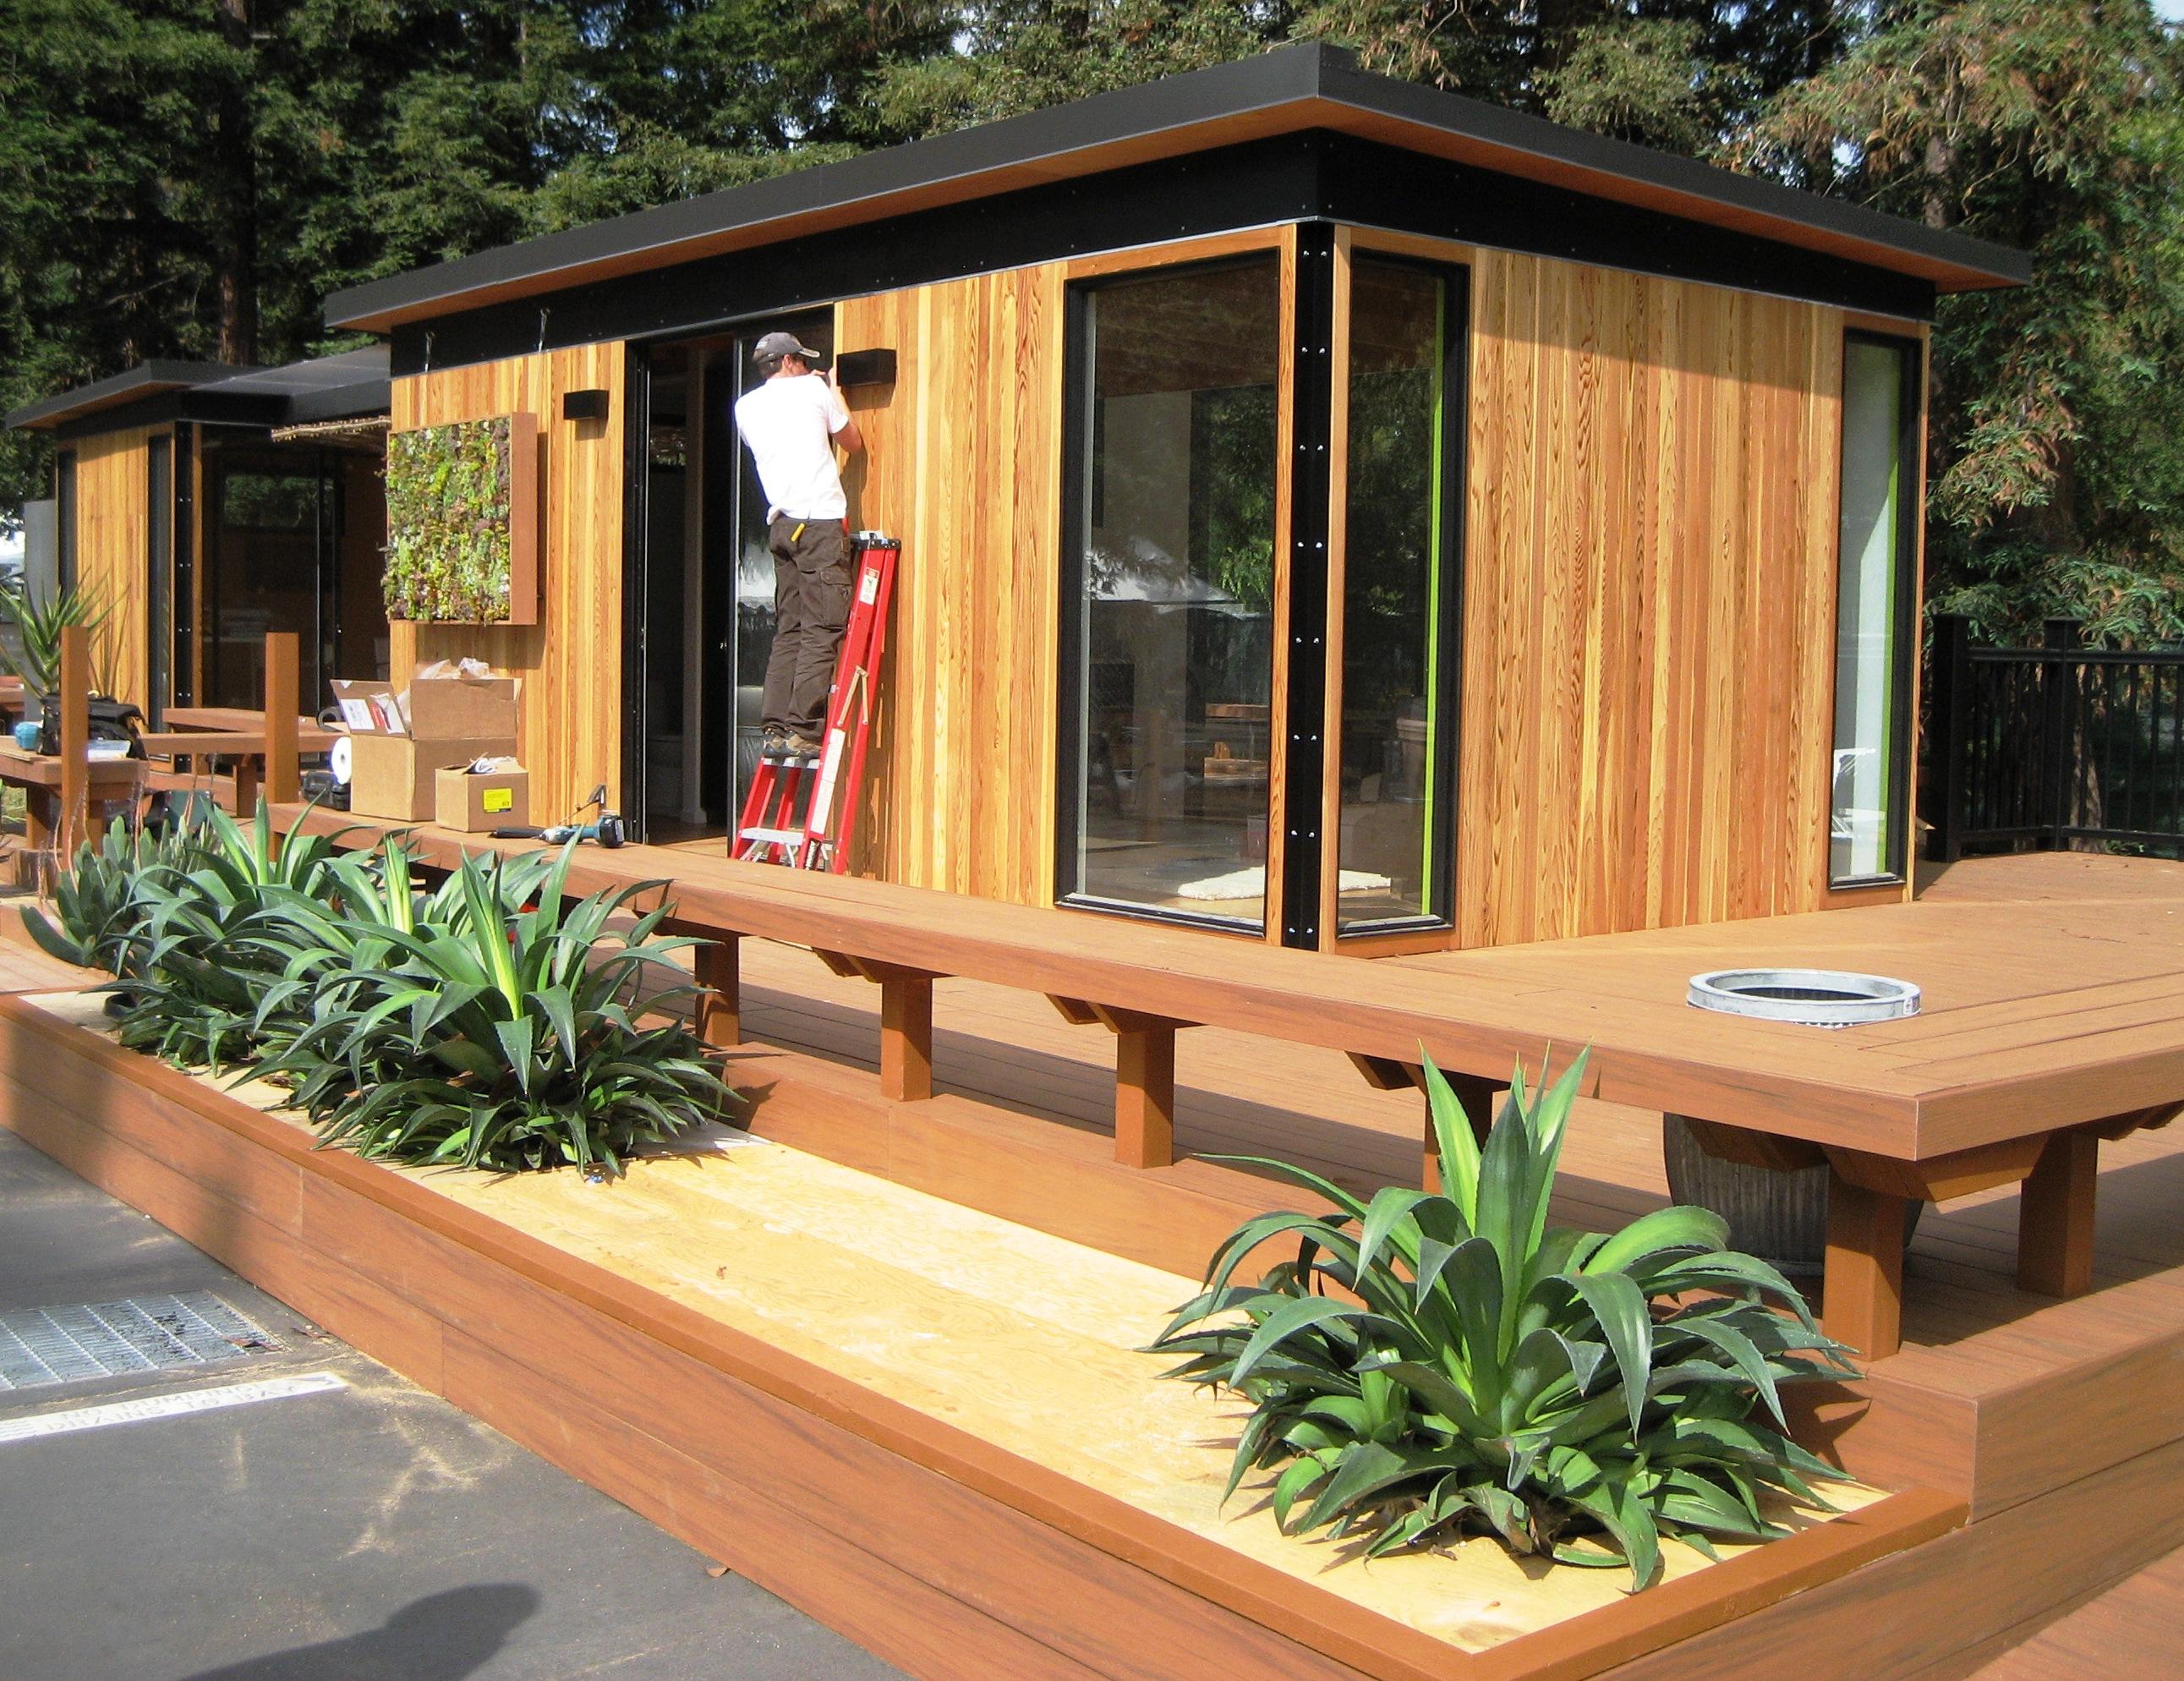 Pool Cabana Kits Design - HomesFeed on Small Pool Cabana Ideas id=75130